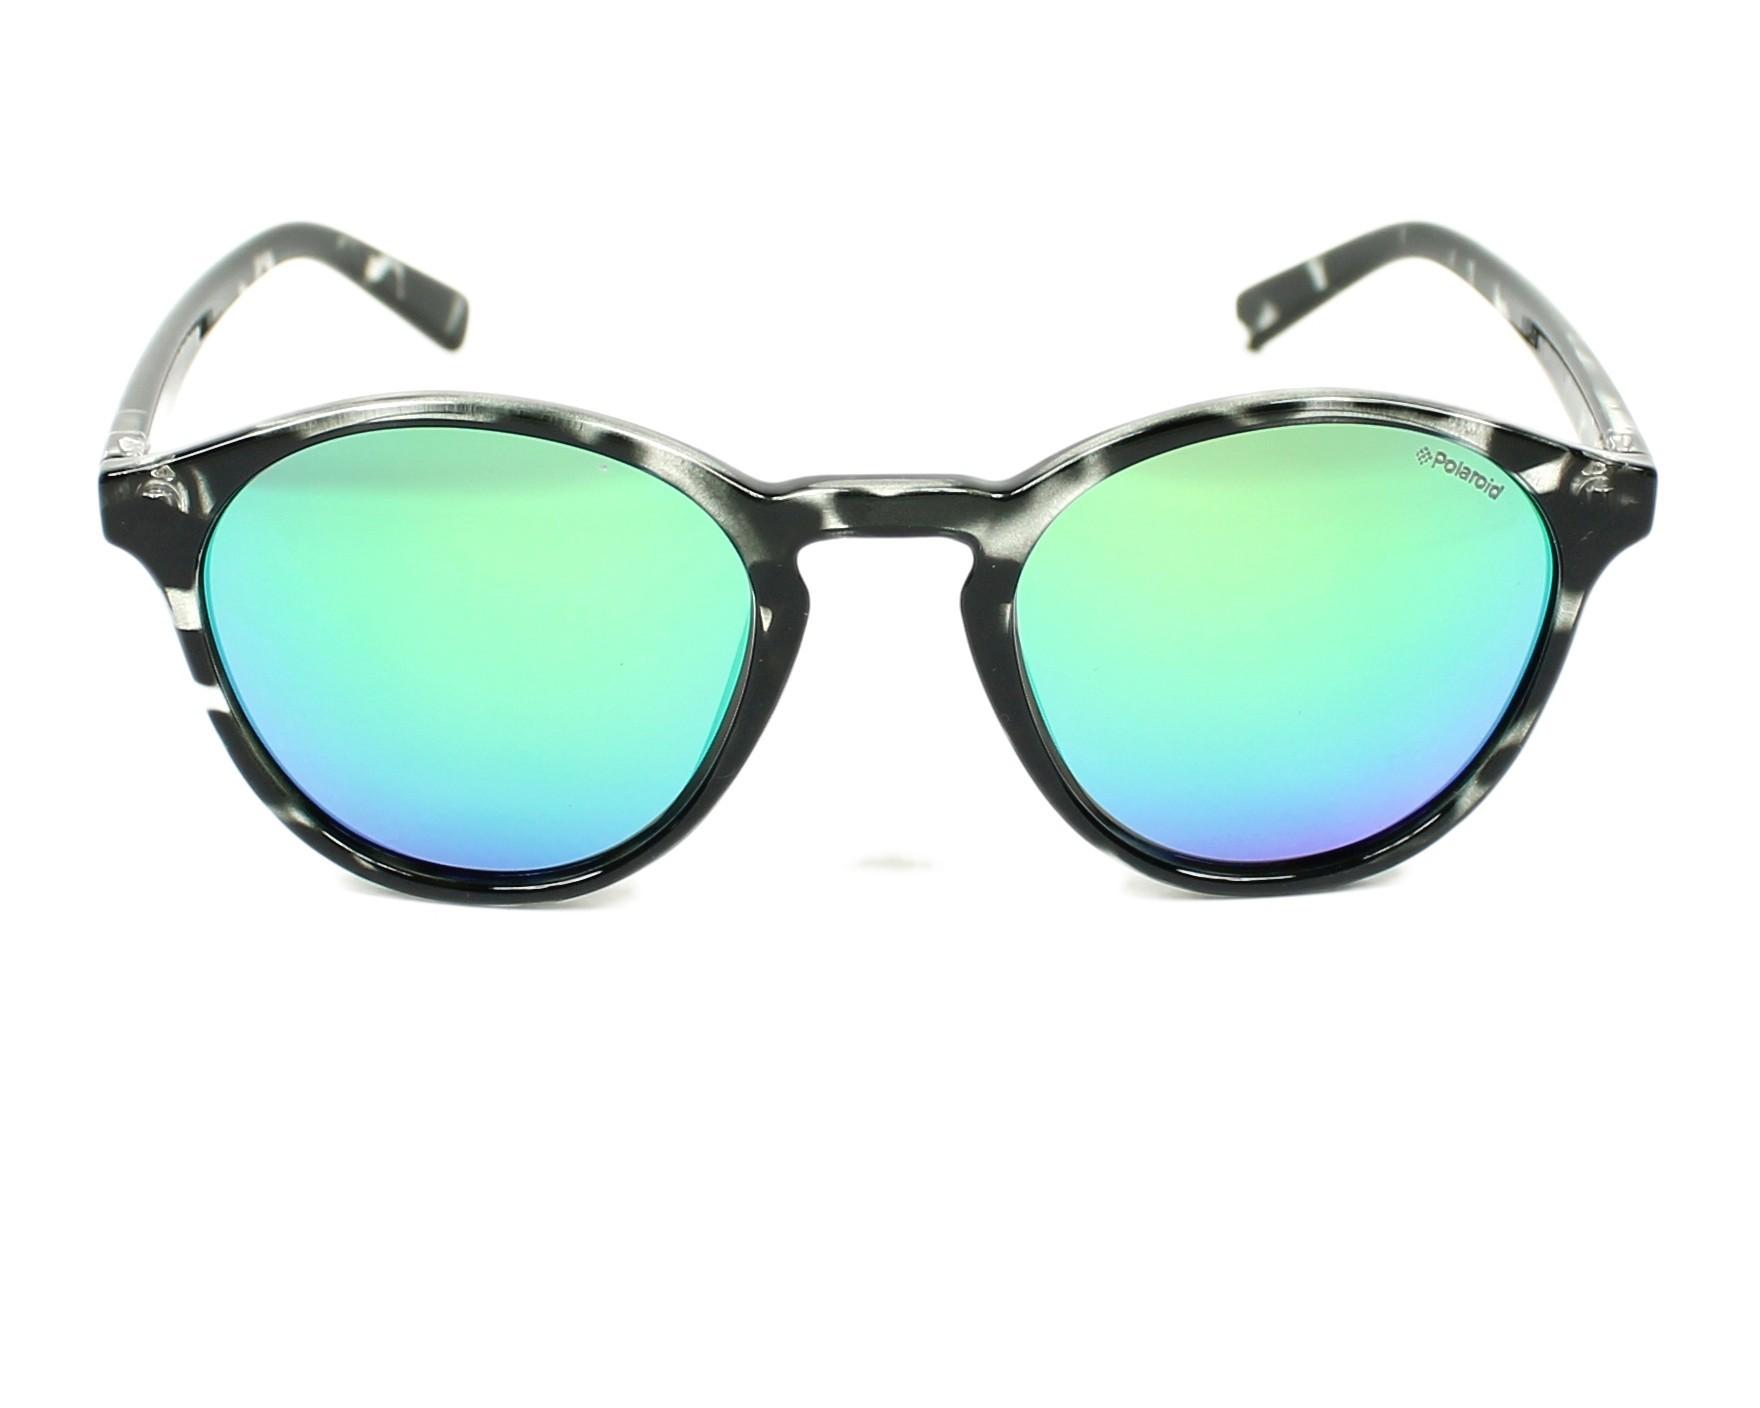 0b6f6fa72569 thumbnail Sunglasses Polaroid PLD-6013-S HJN K7 - Grey front view